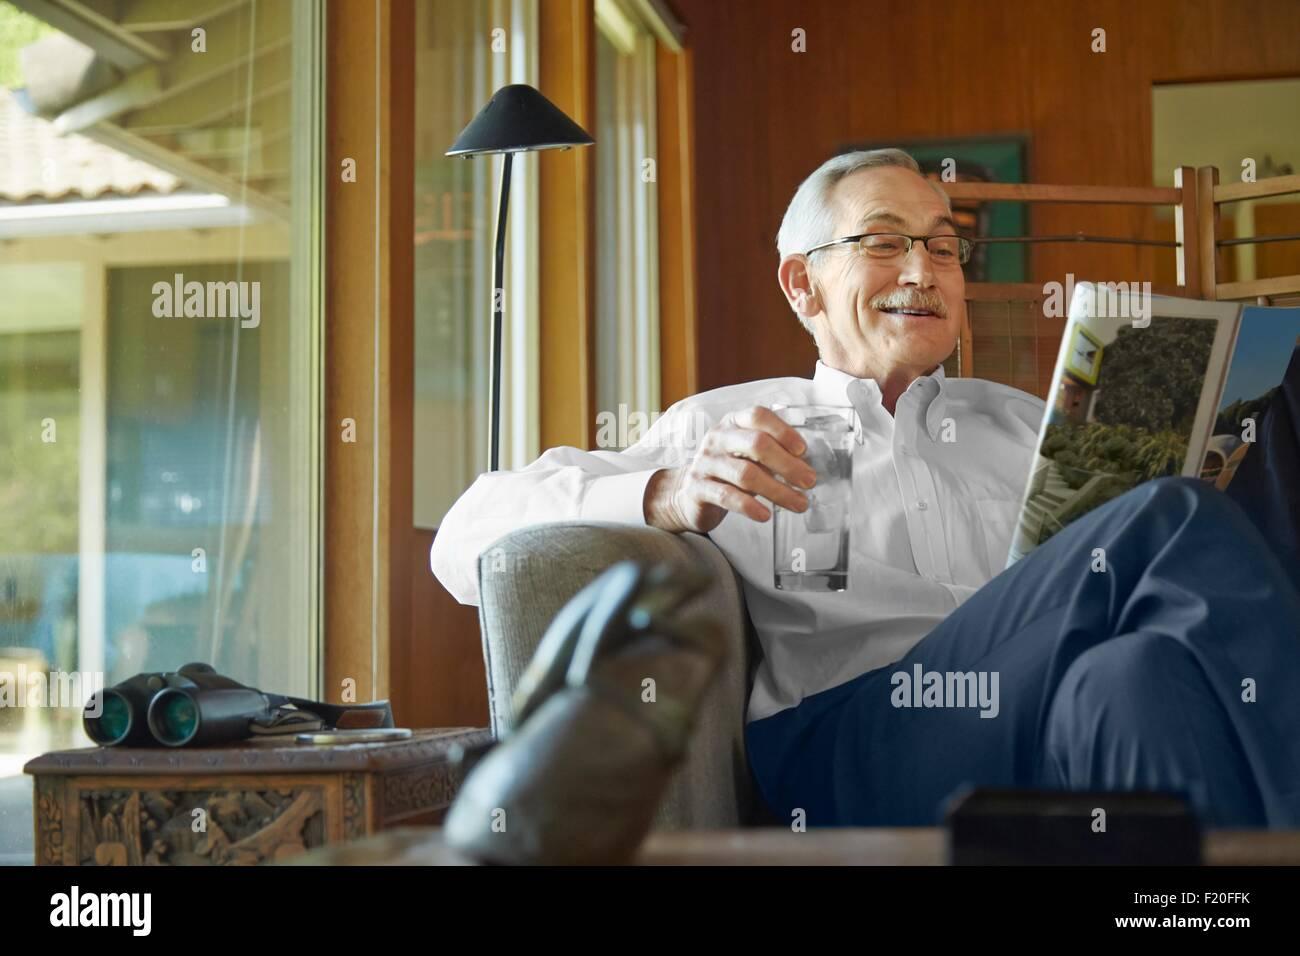 Senior man at home, reading magazine - Stock Image